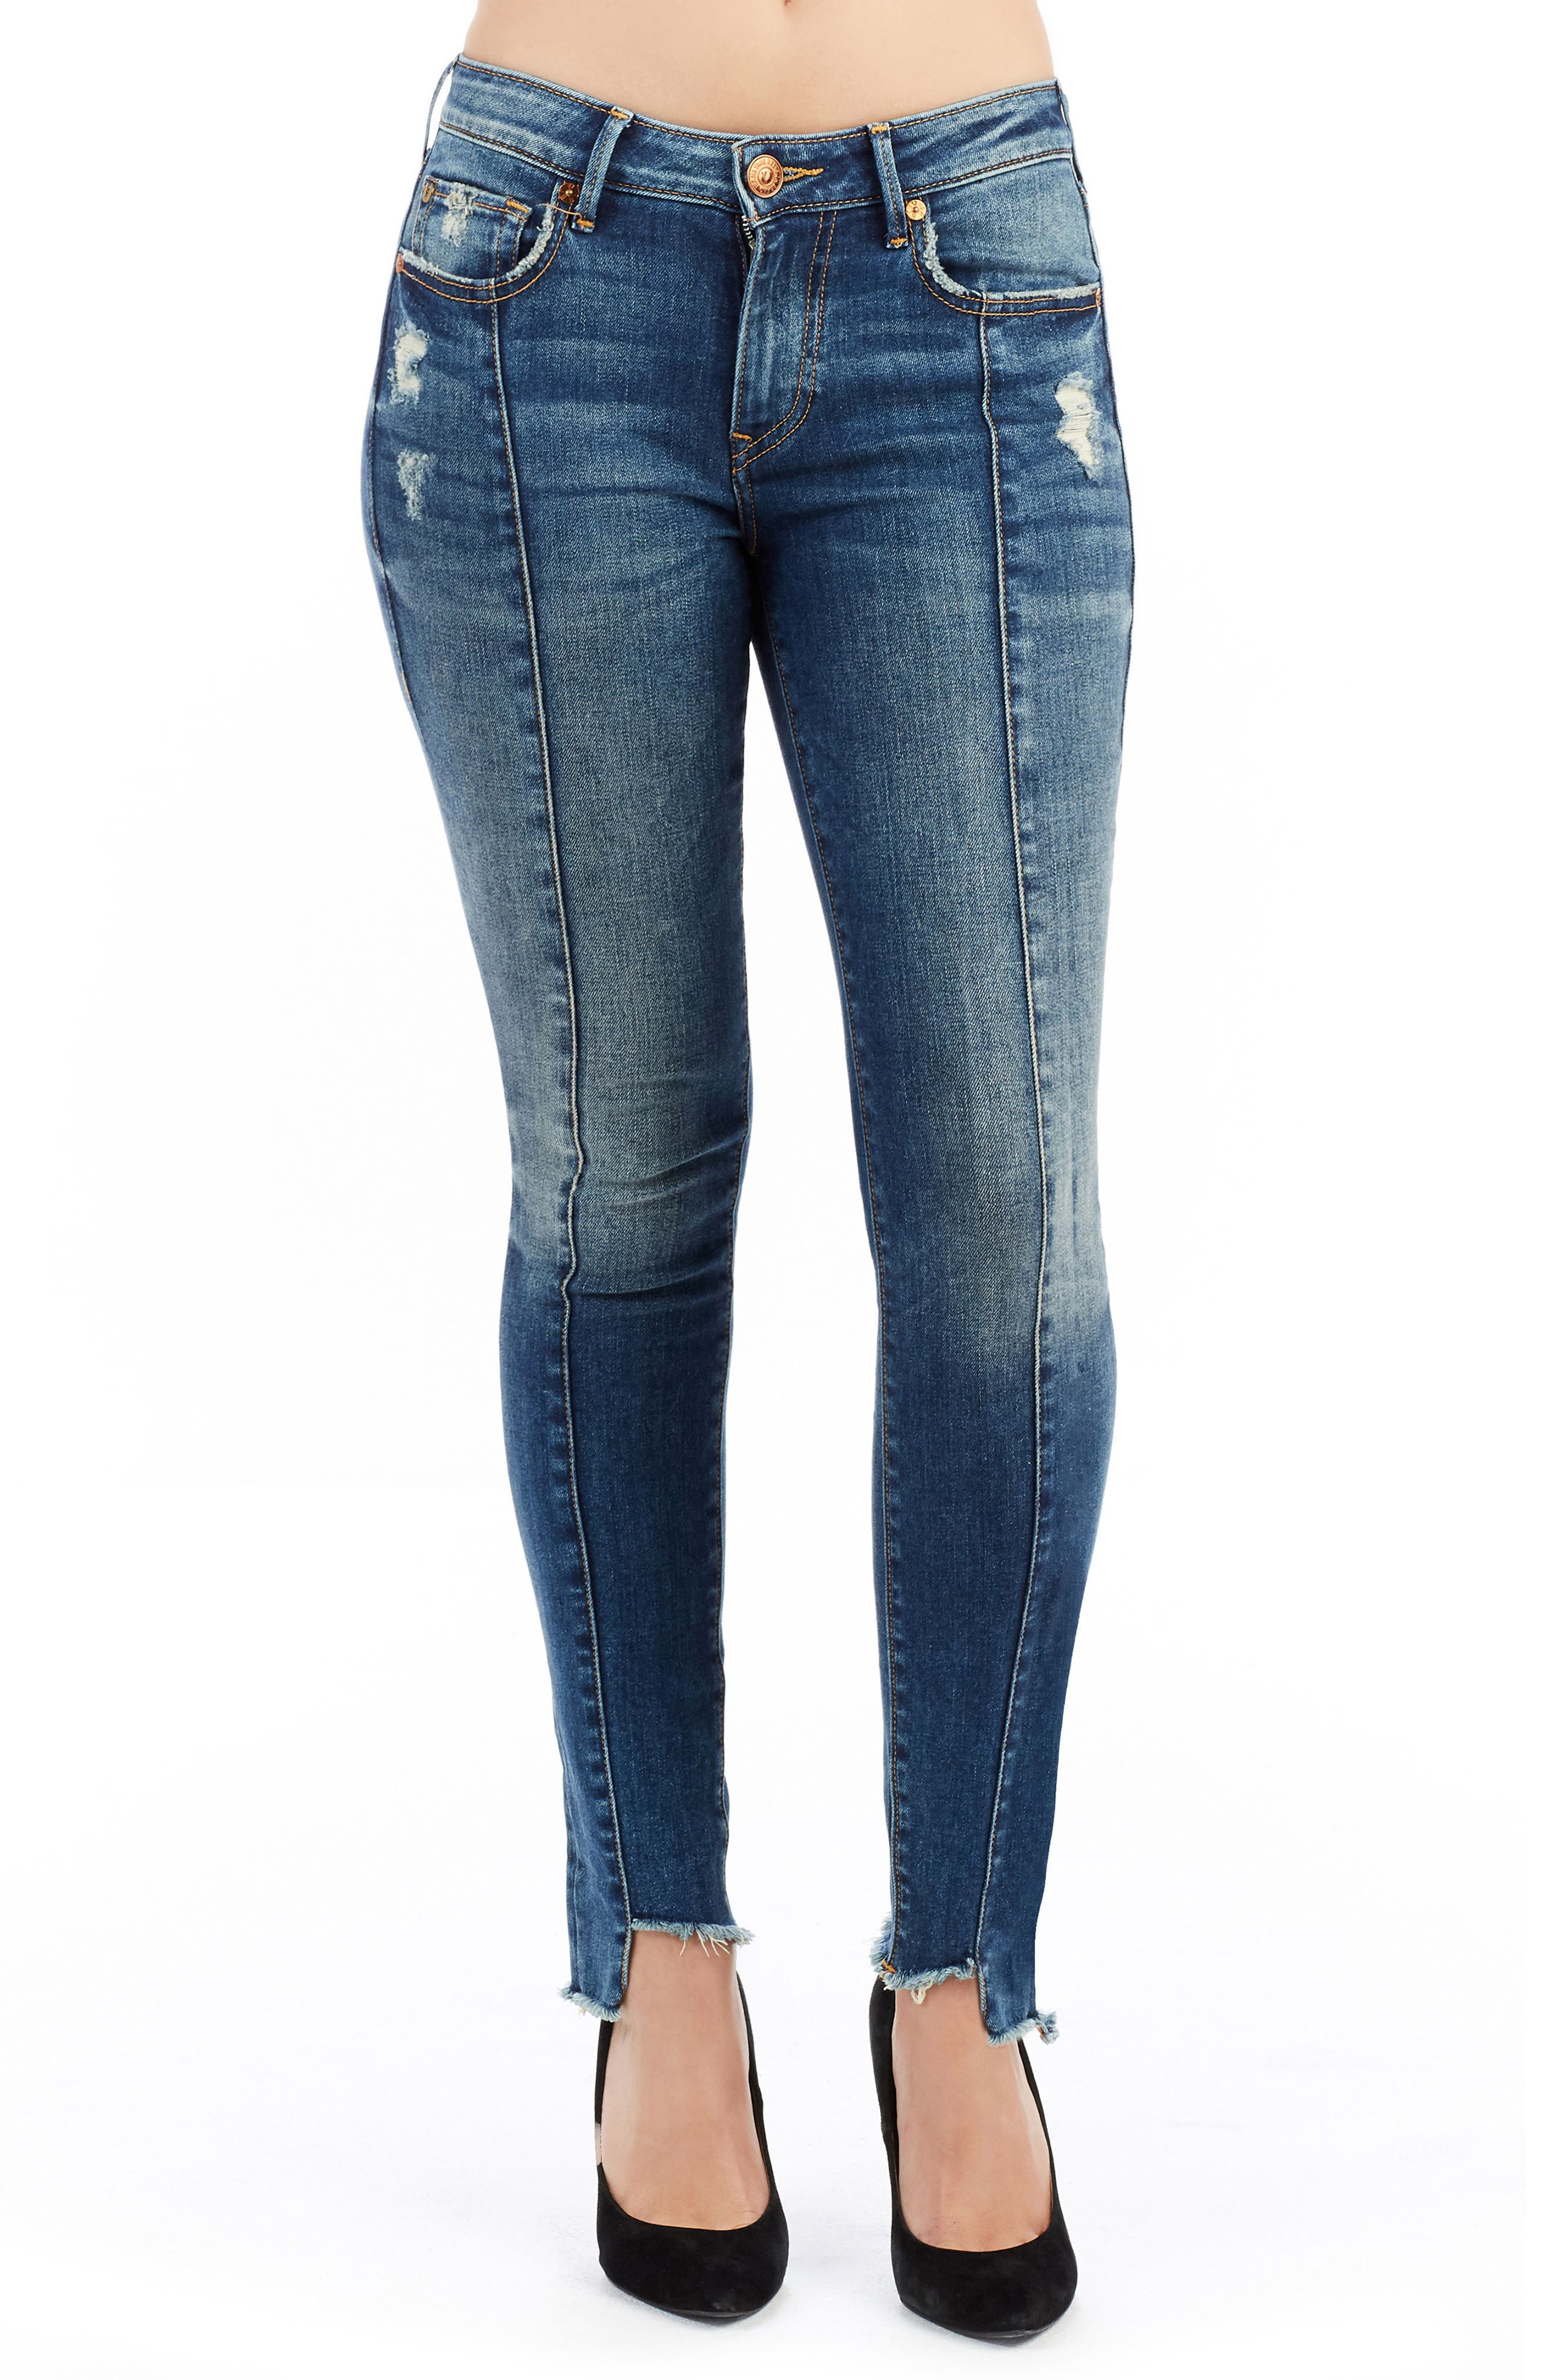 True Religion Brand Jeans Jennie Curvy Skinny Jeans (Famous Blue Rock)